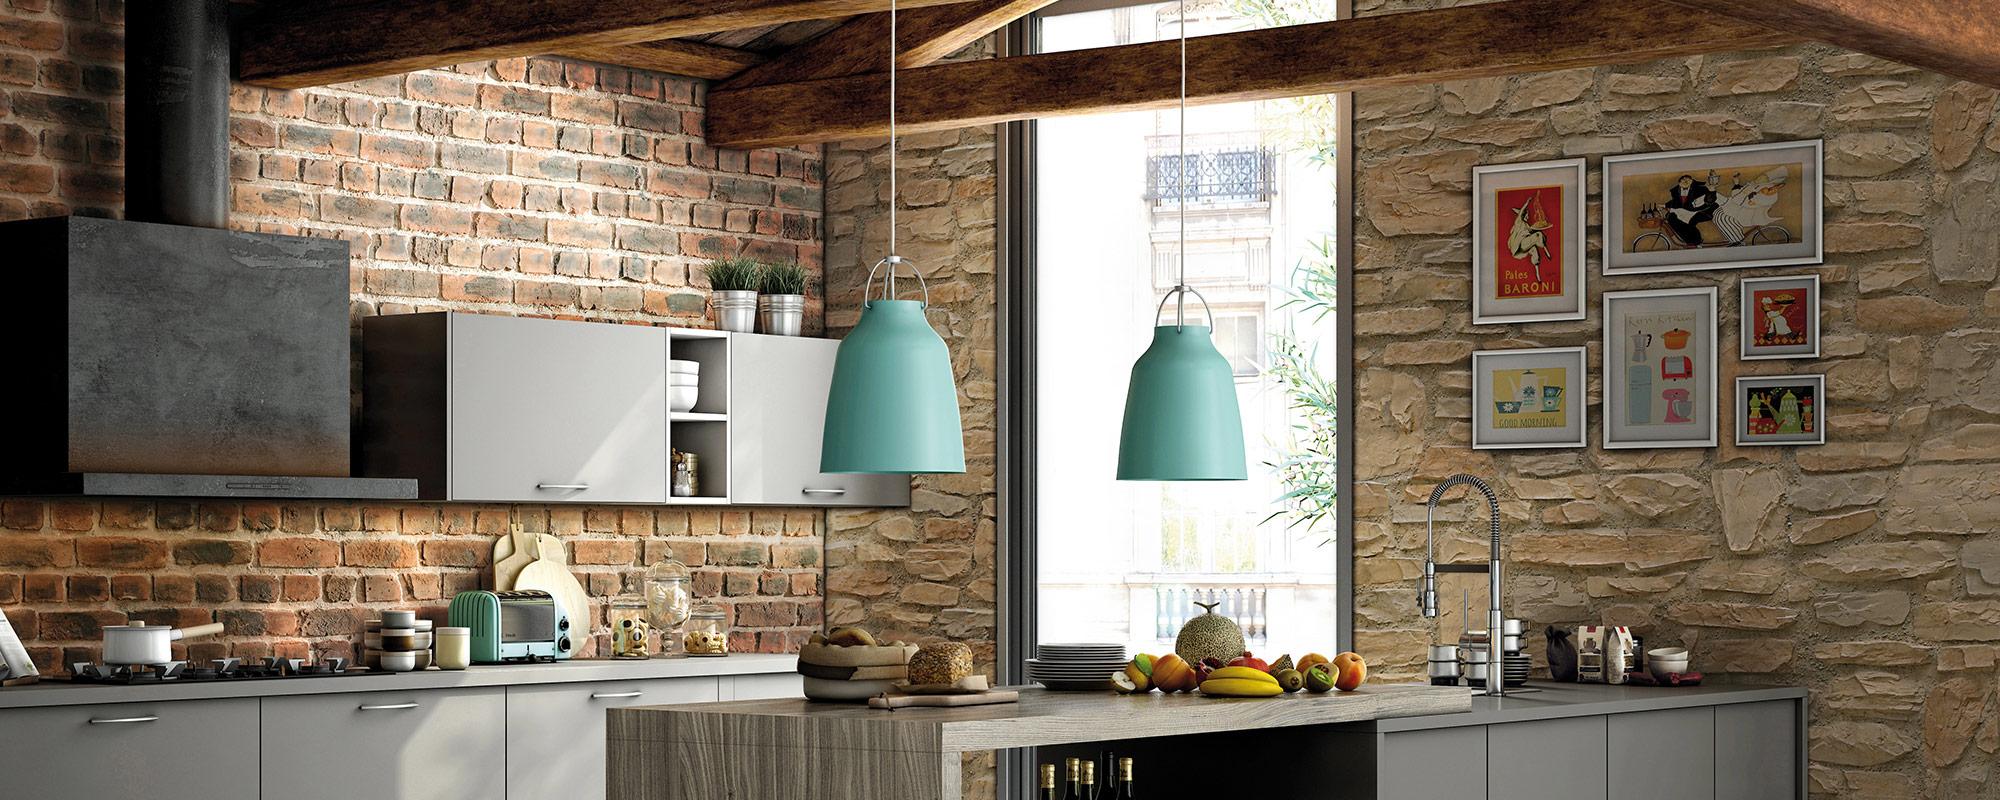 Evocacines vestidor abierto combi robleblanco peugeot - Paneles decorativos para exterior ...